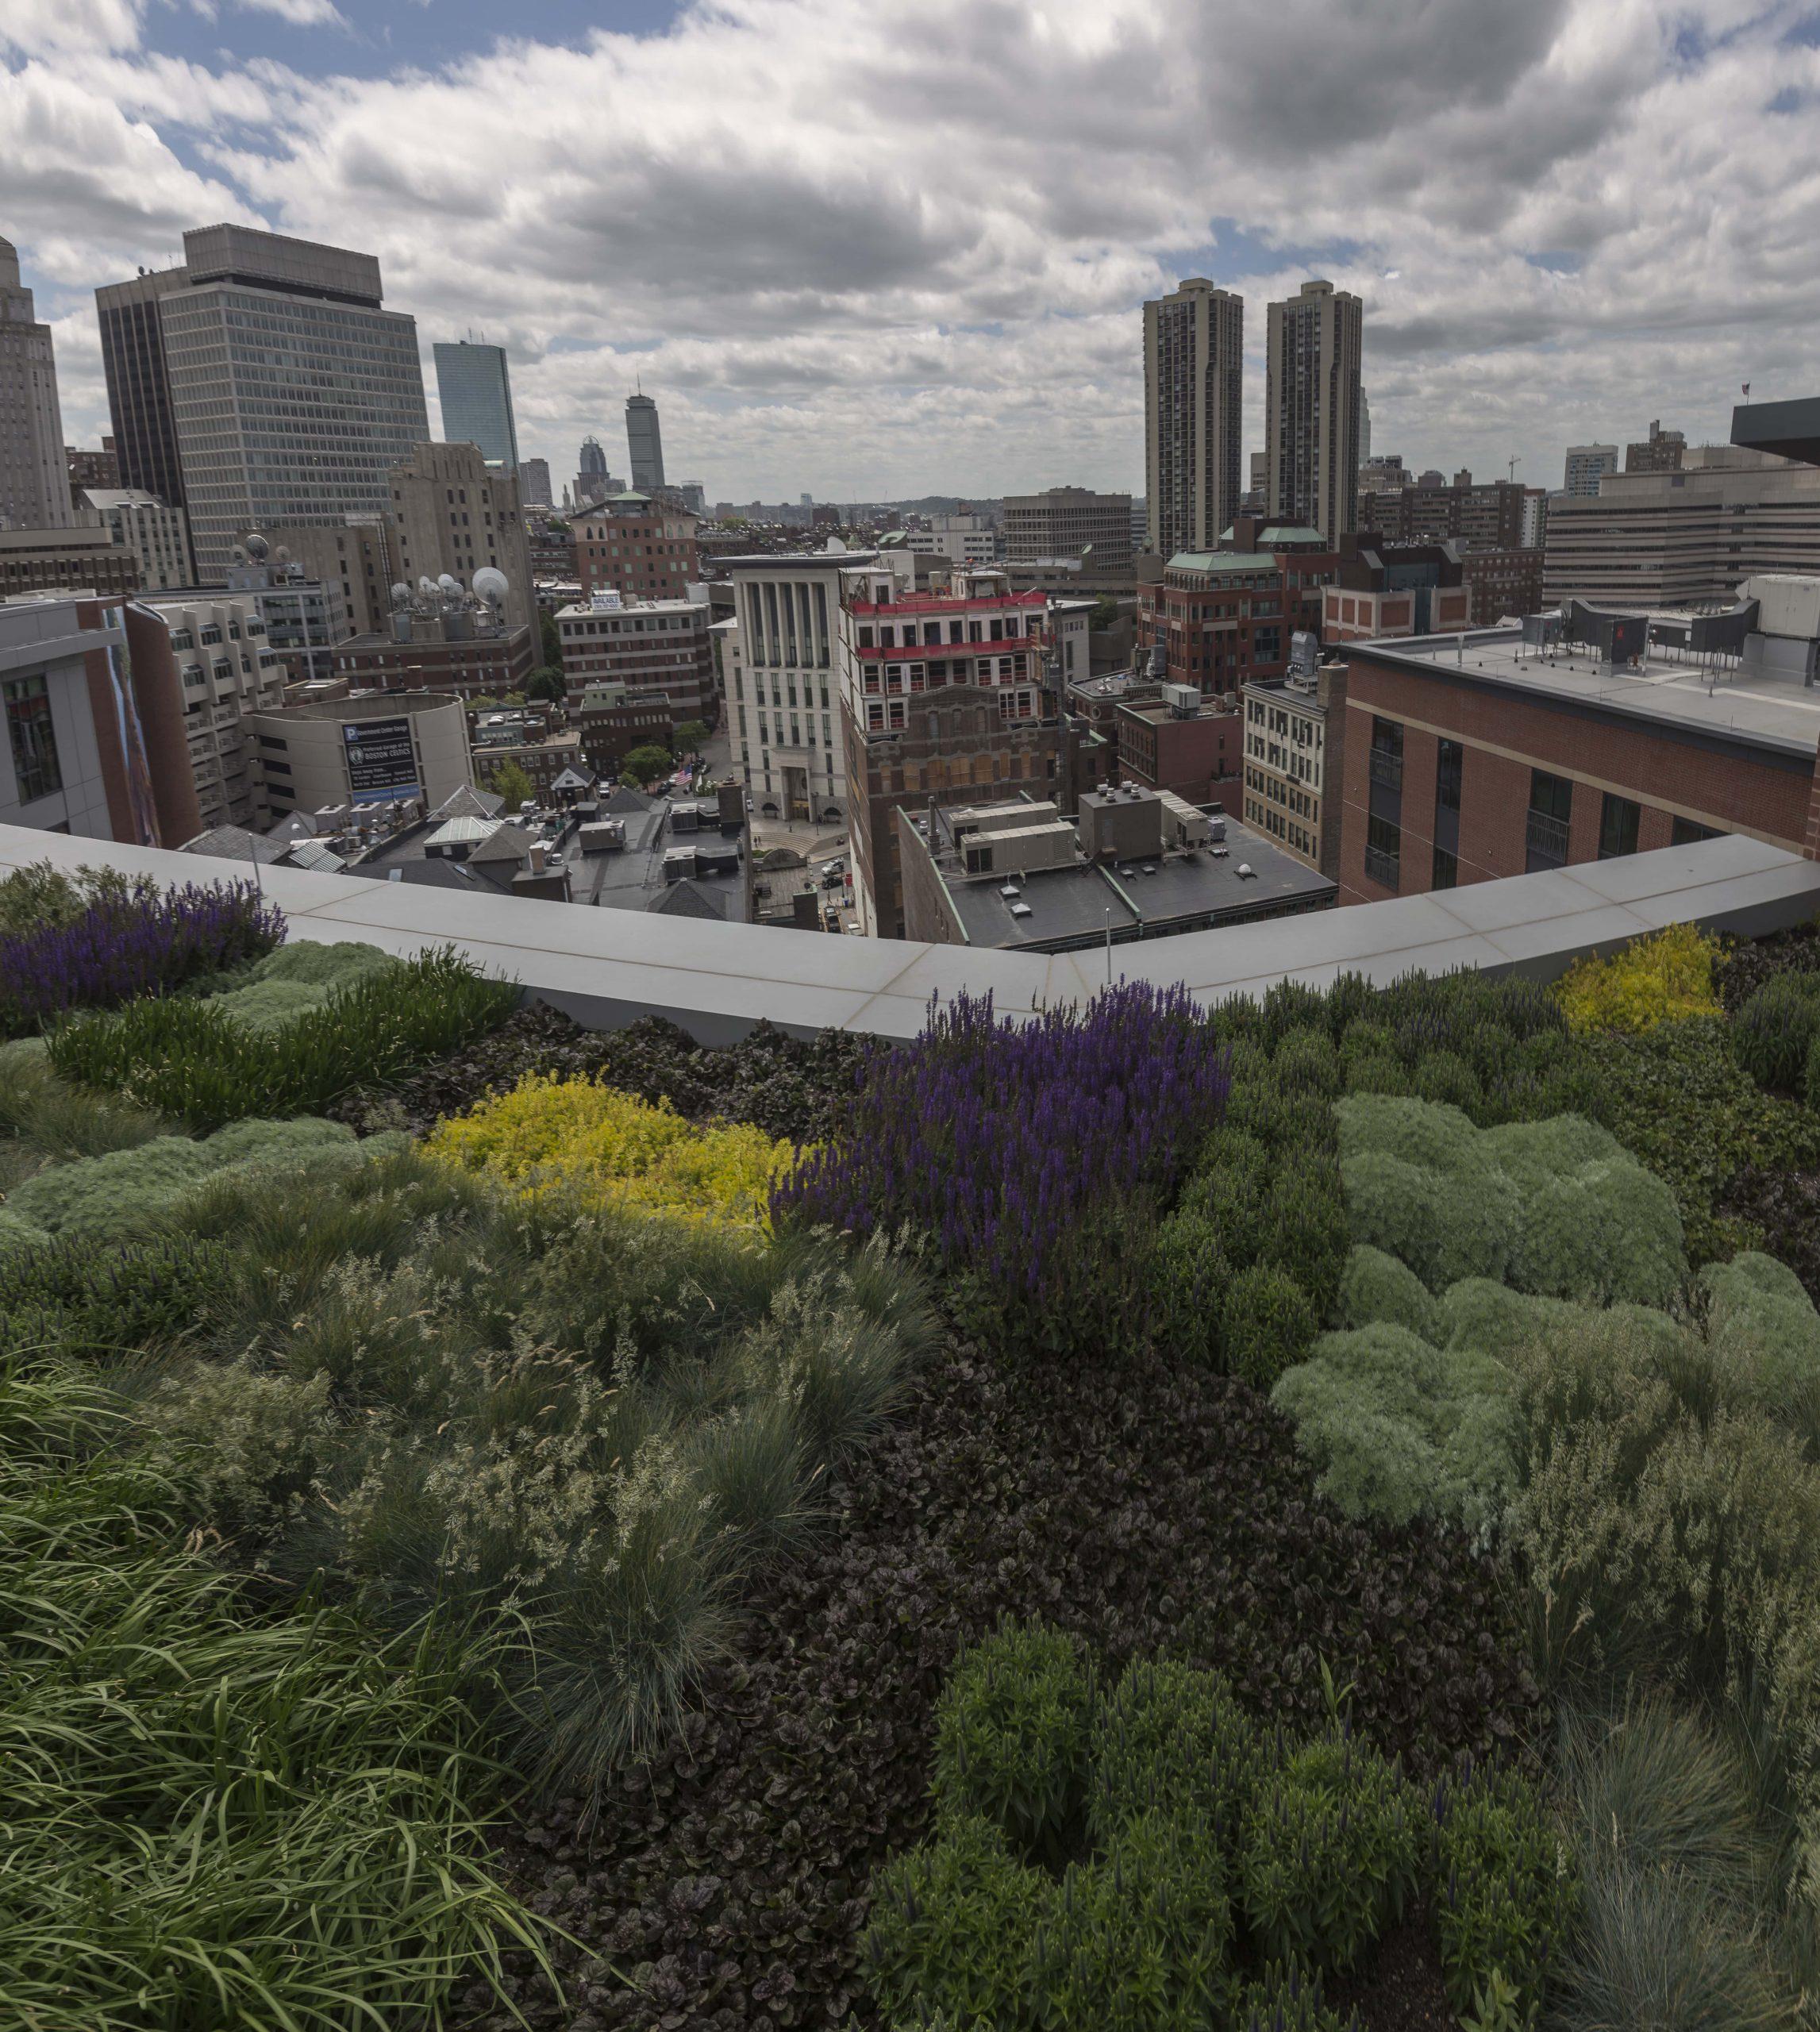 City overlook from a terrace garden on Canal Street.